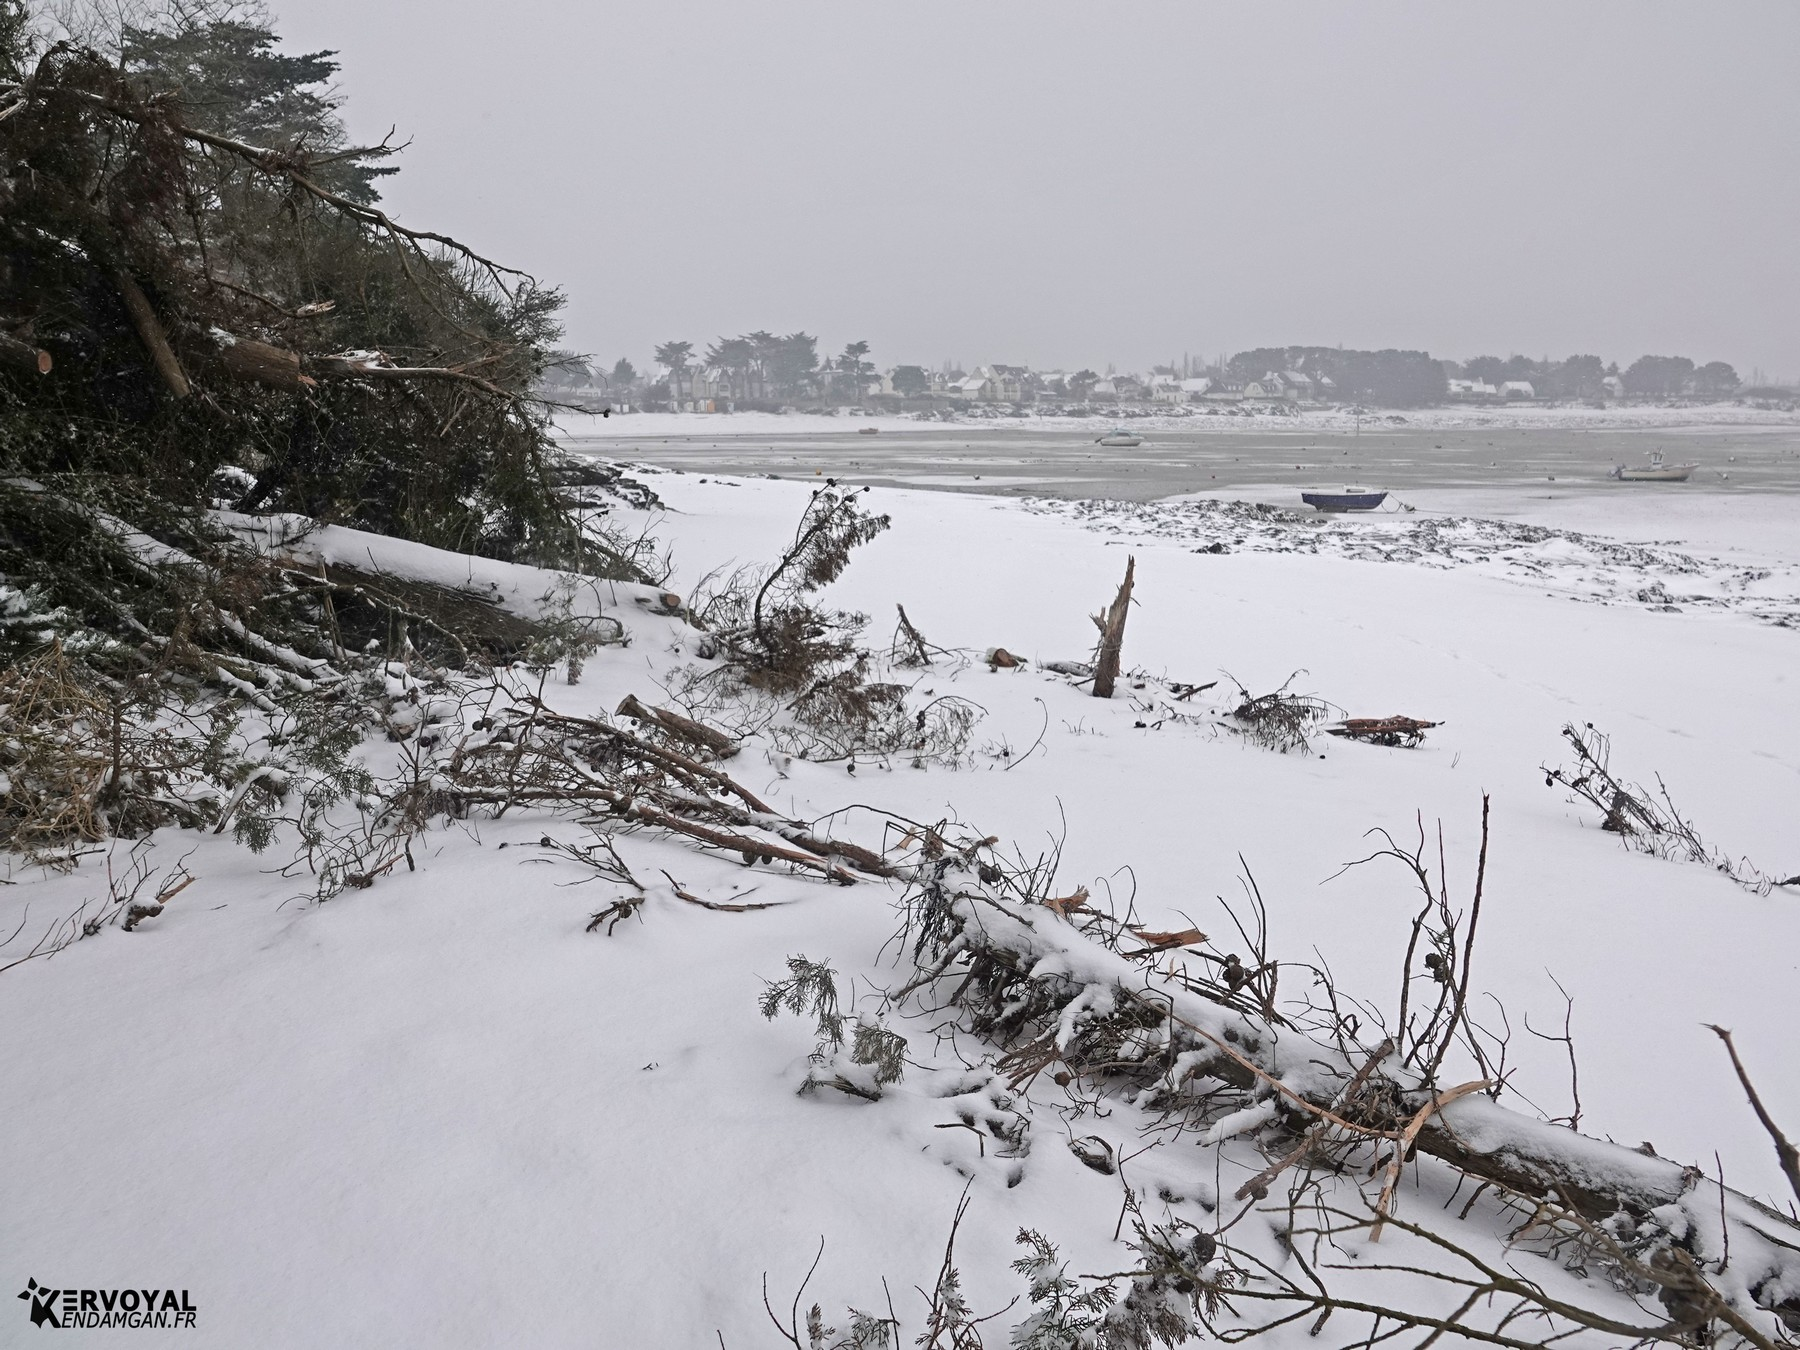 neige à kervoyal 11 février 2021 damgan morbihan (40)